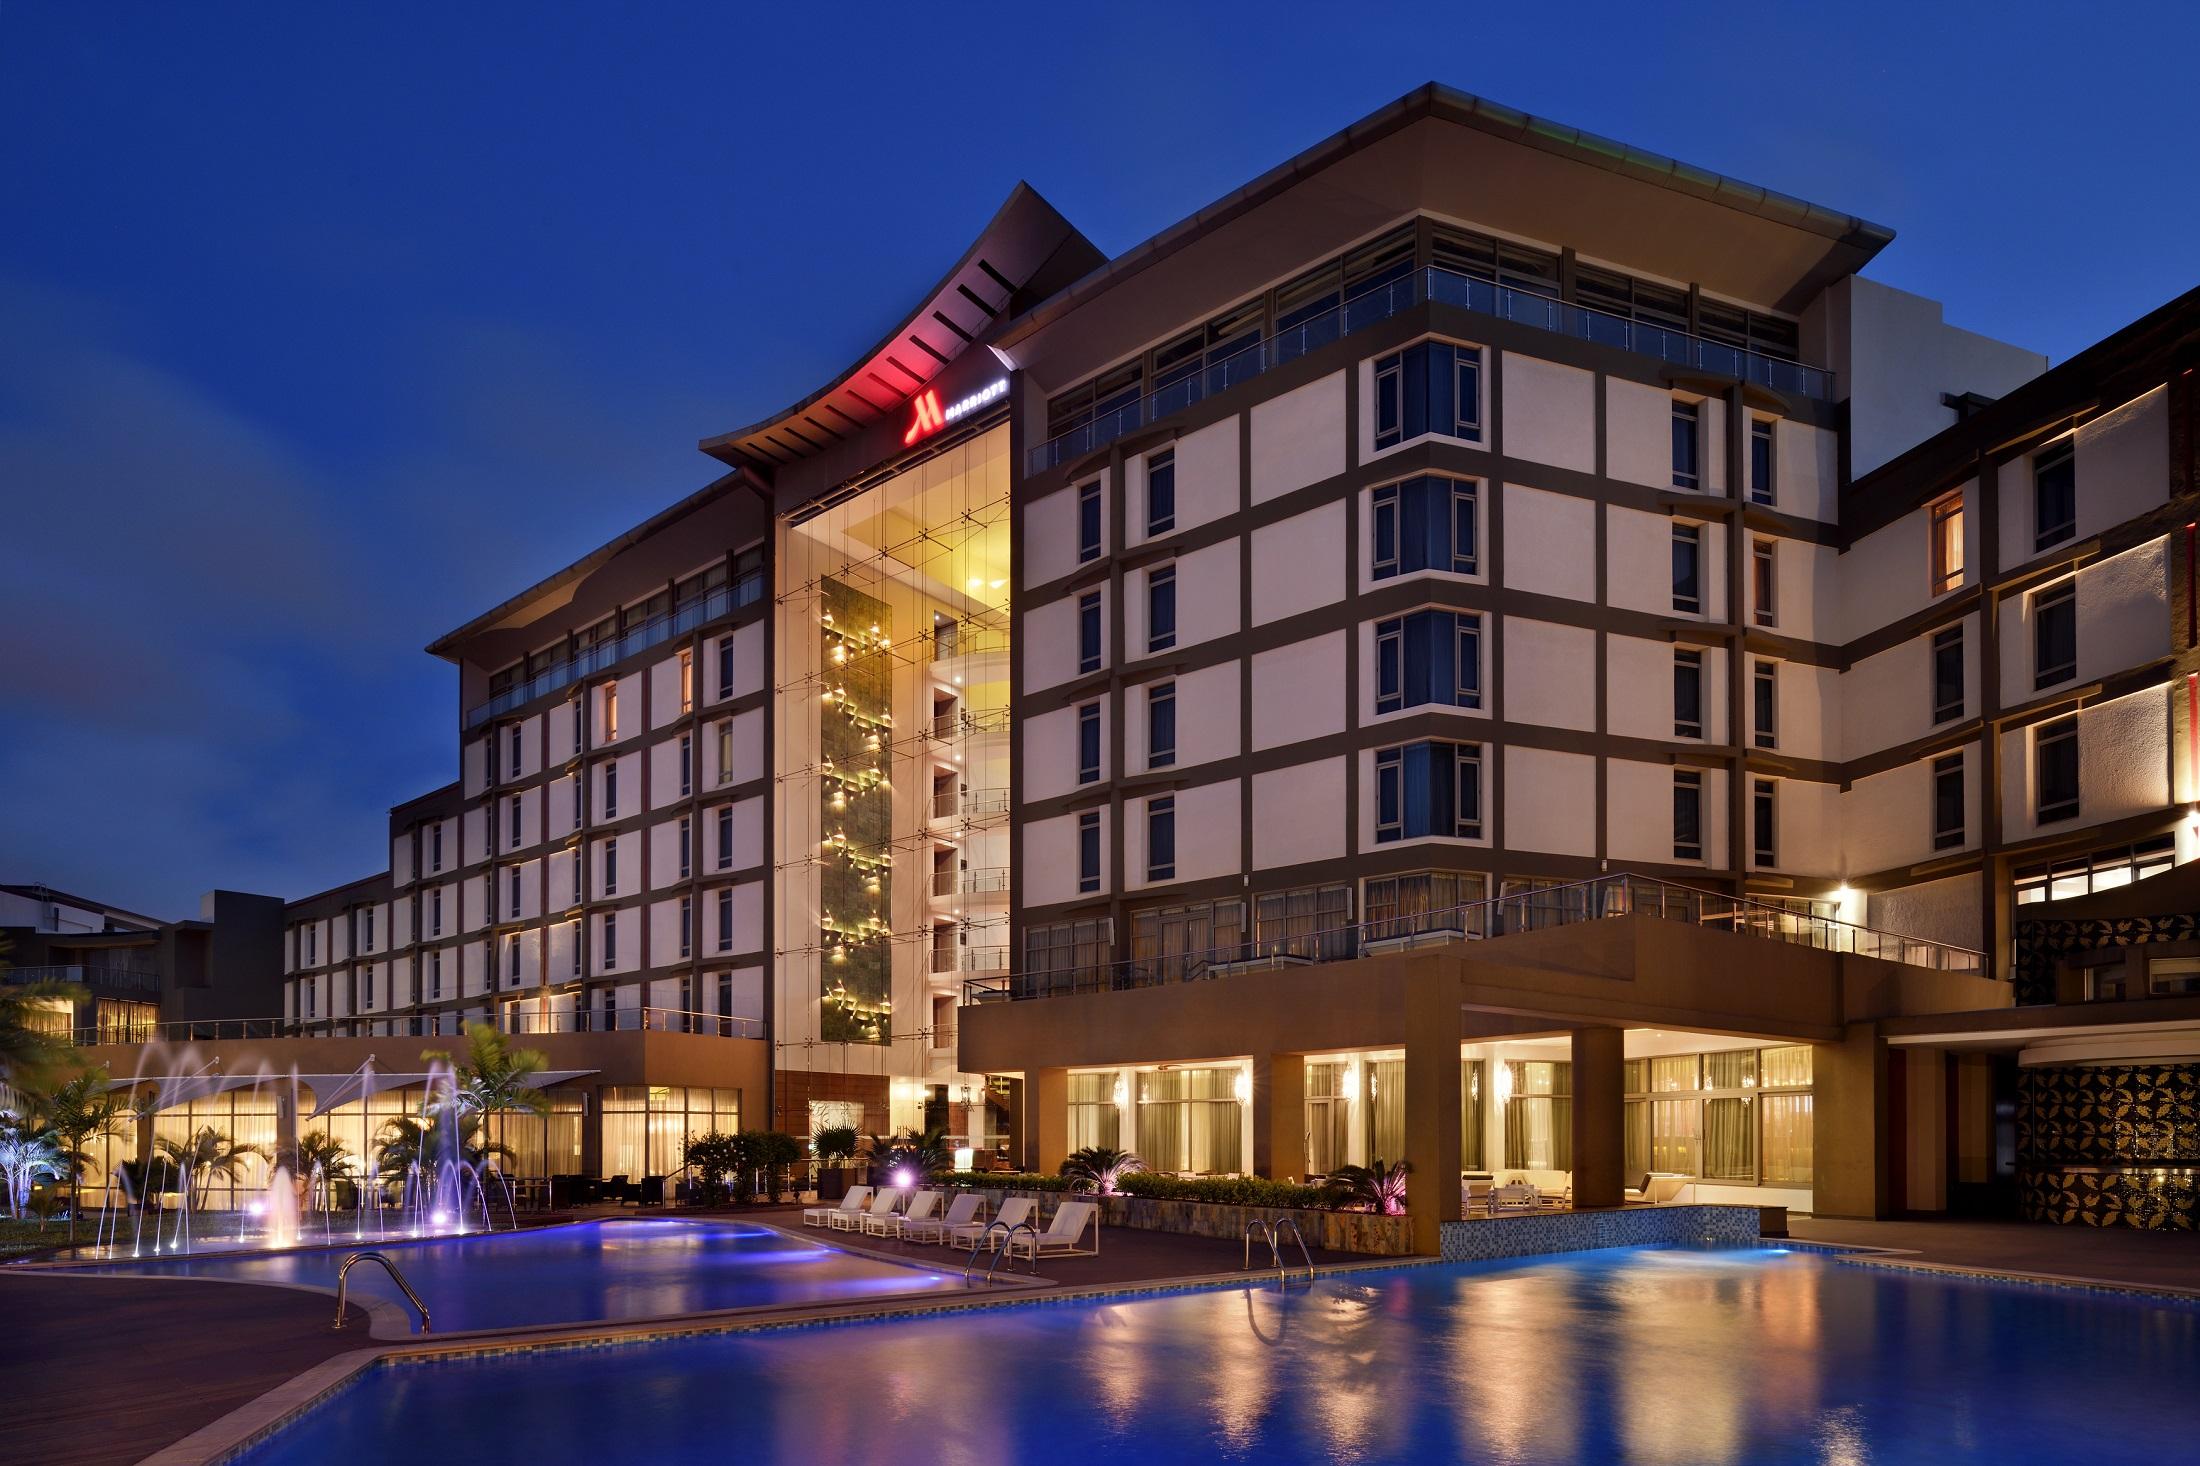 Accra Mariott Hotel